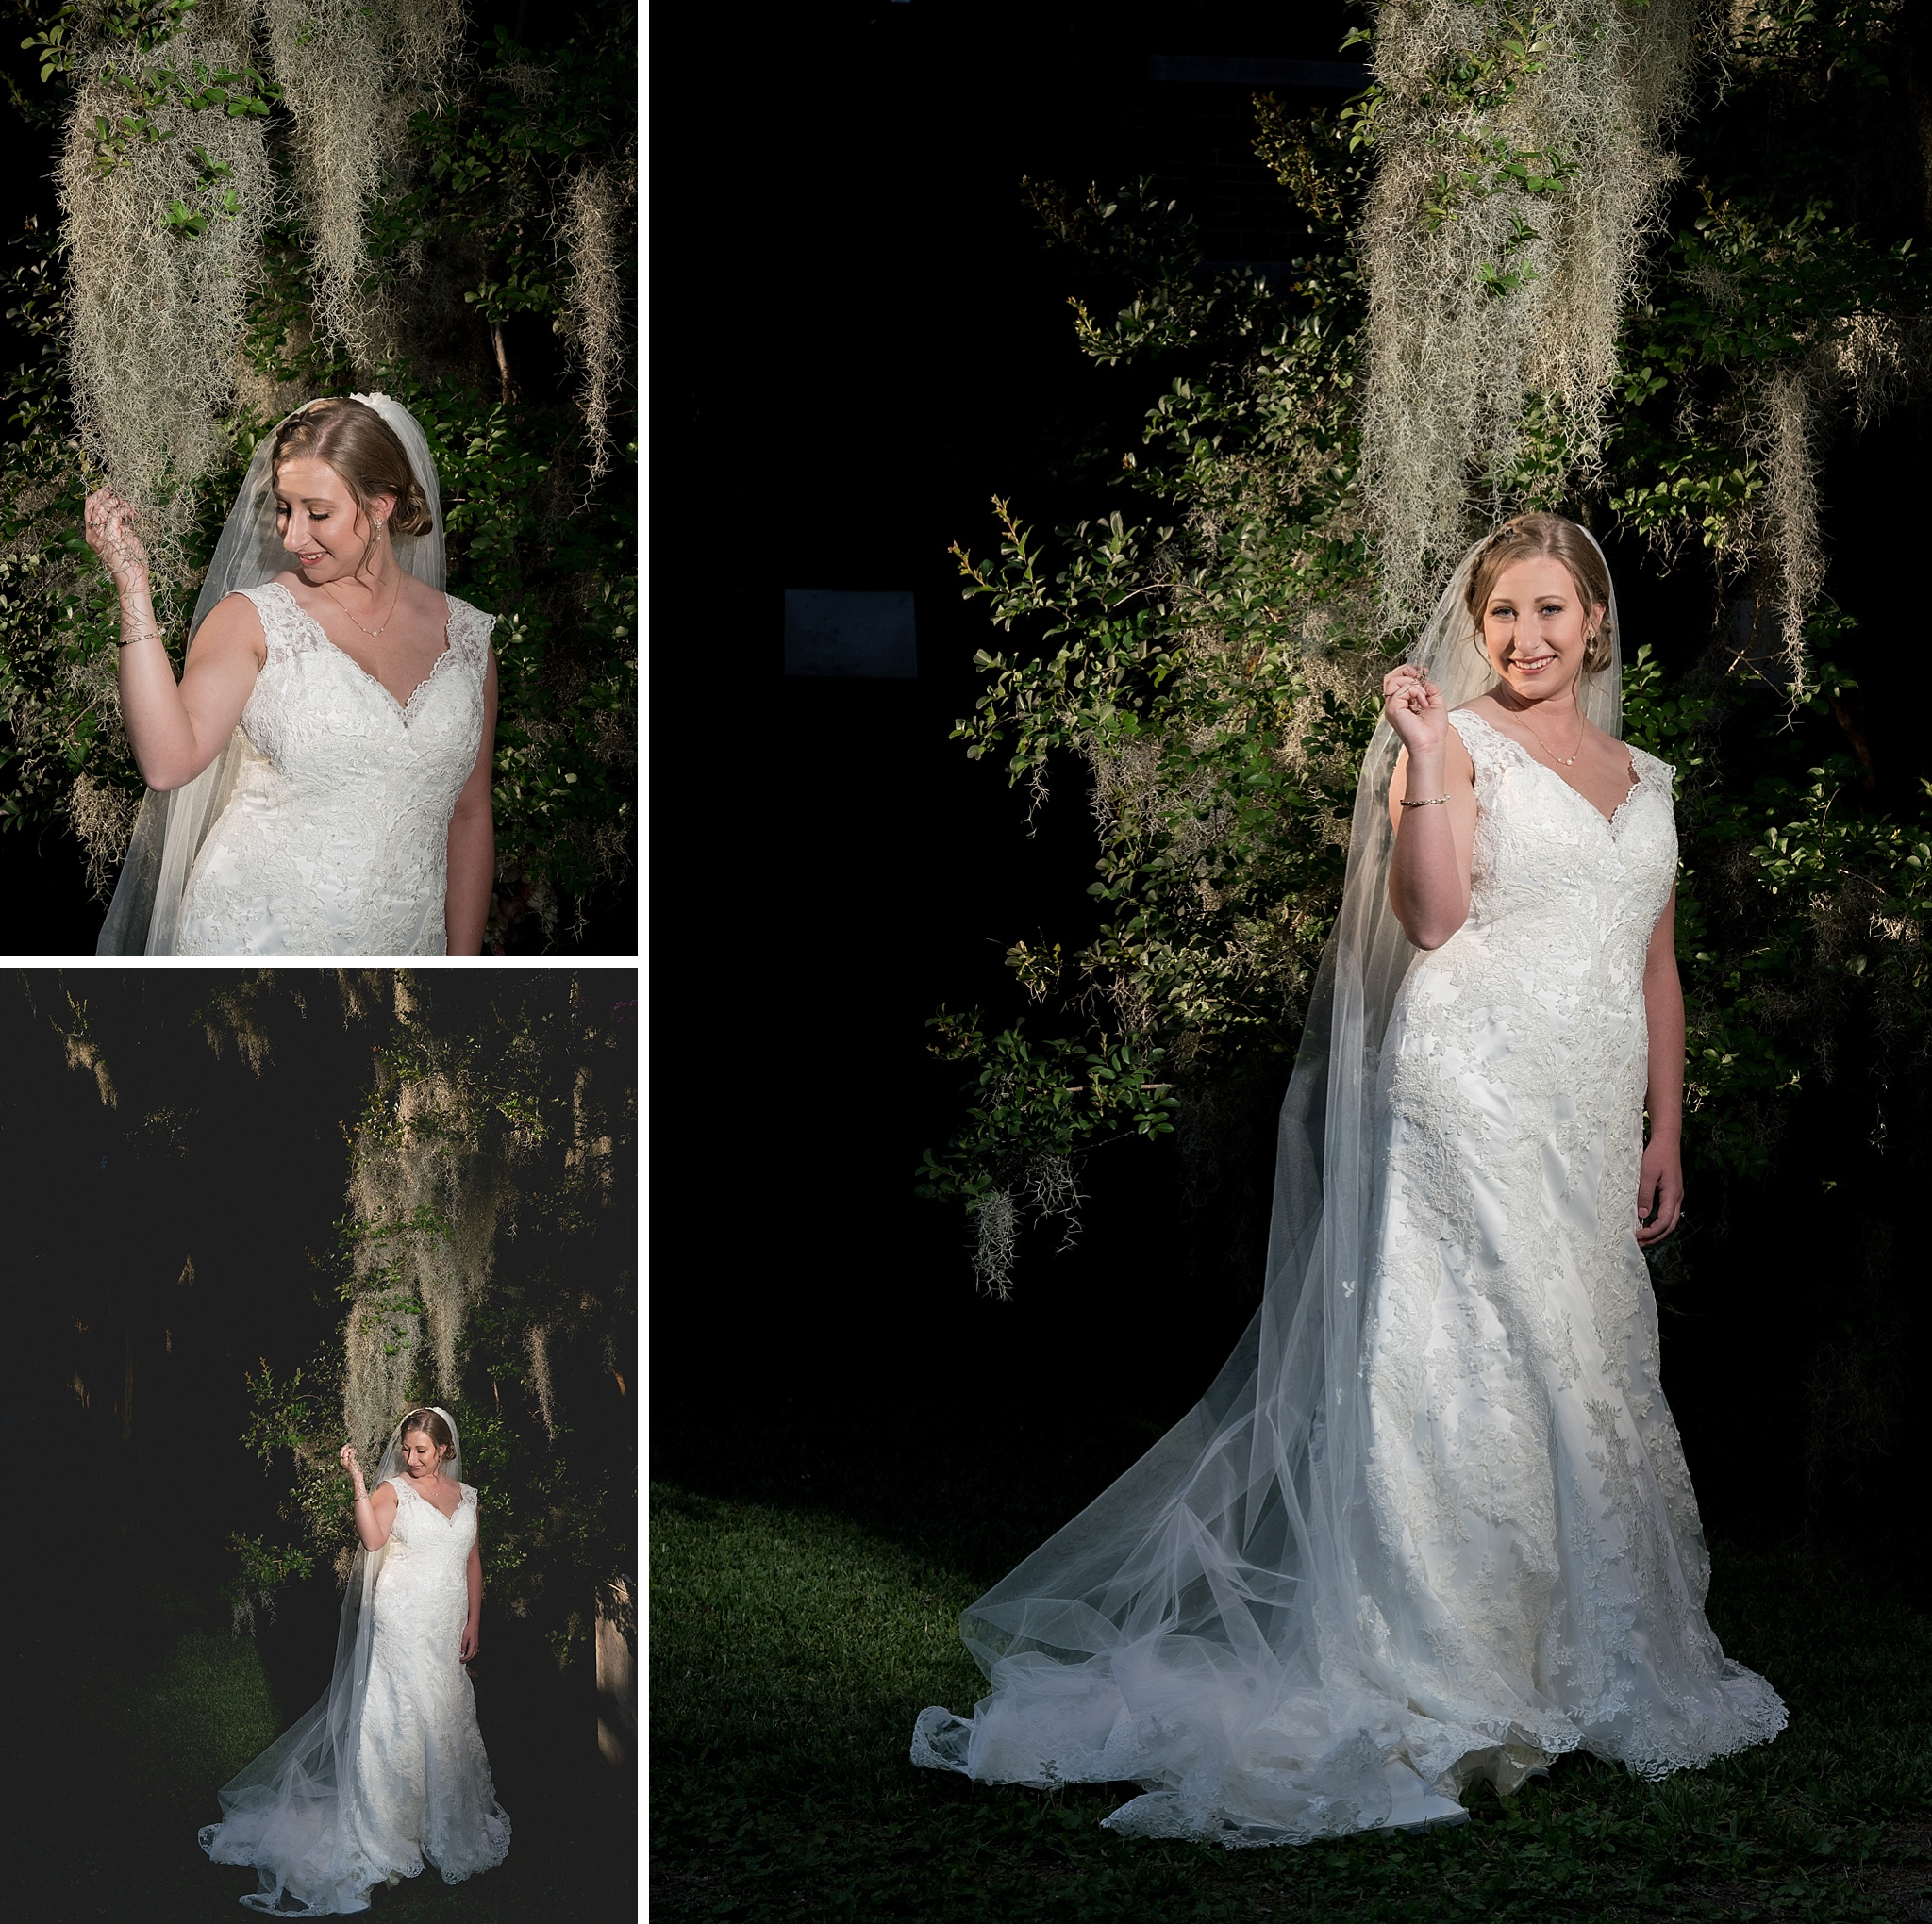 New-Bern-NC-Wedding-Photographer-061.jpg